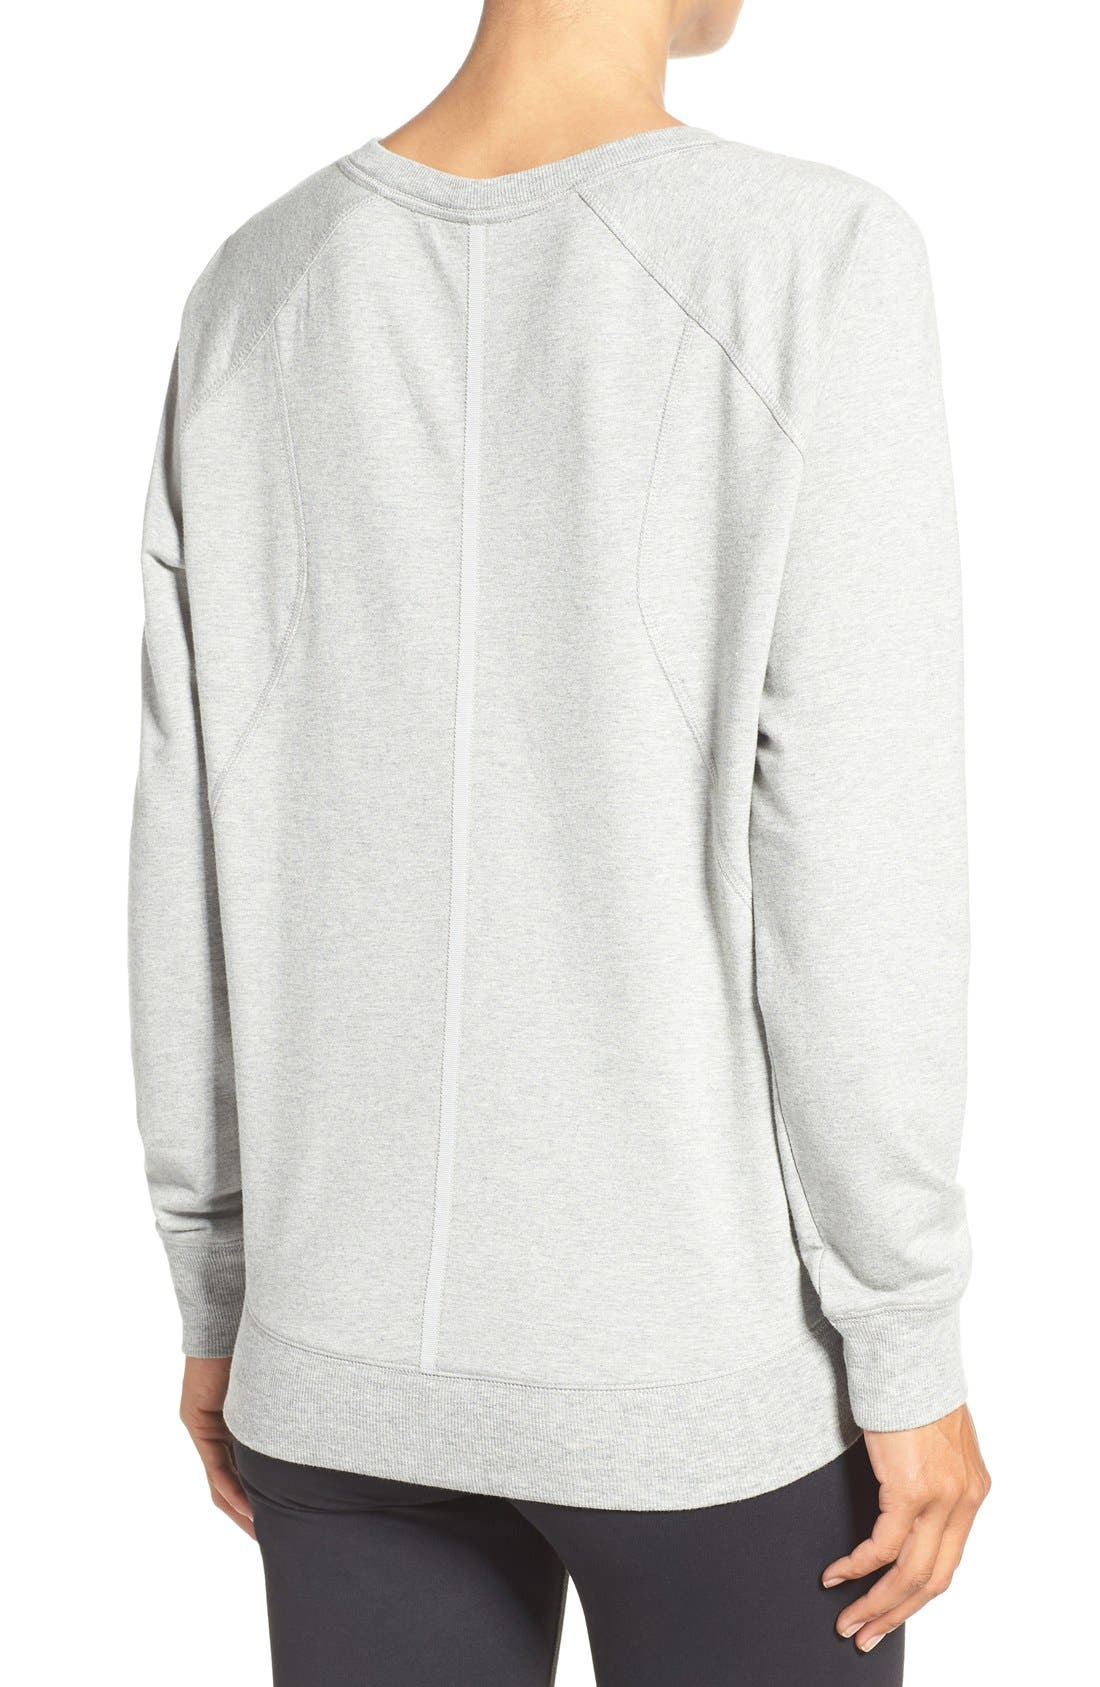 Alternate Image 2  - Zella 'Luxesport' Long Sleeve Sweatshirt